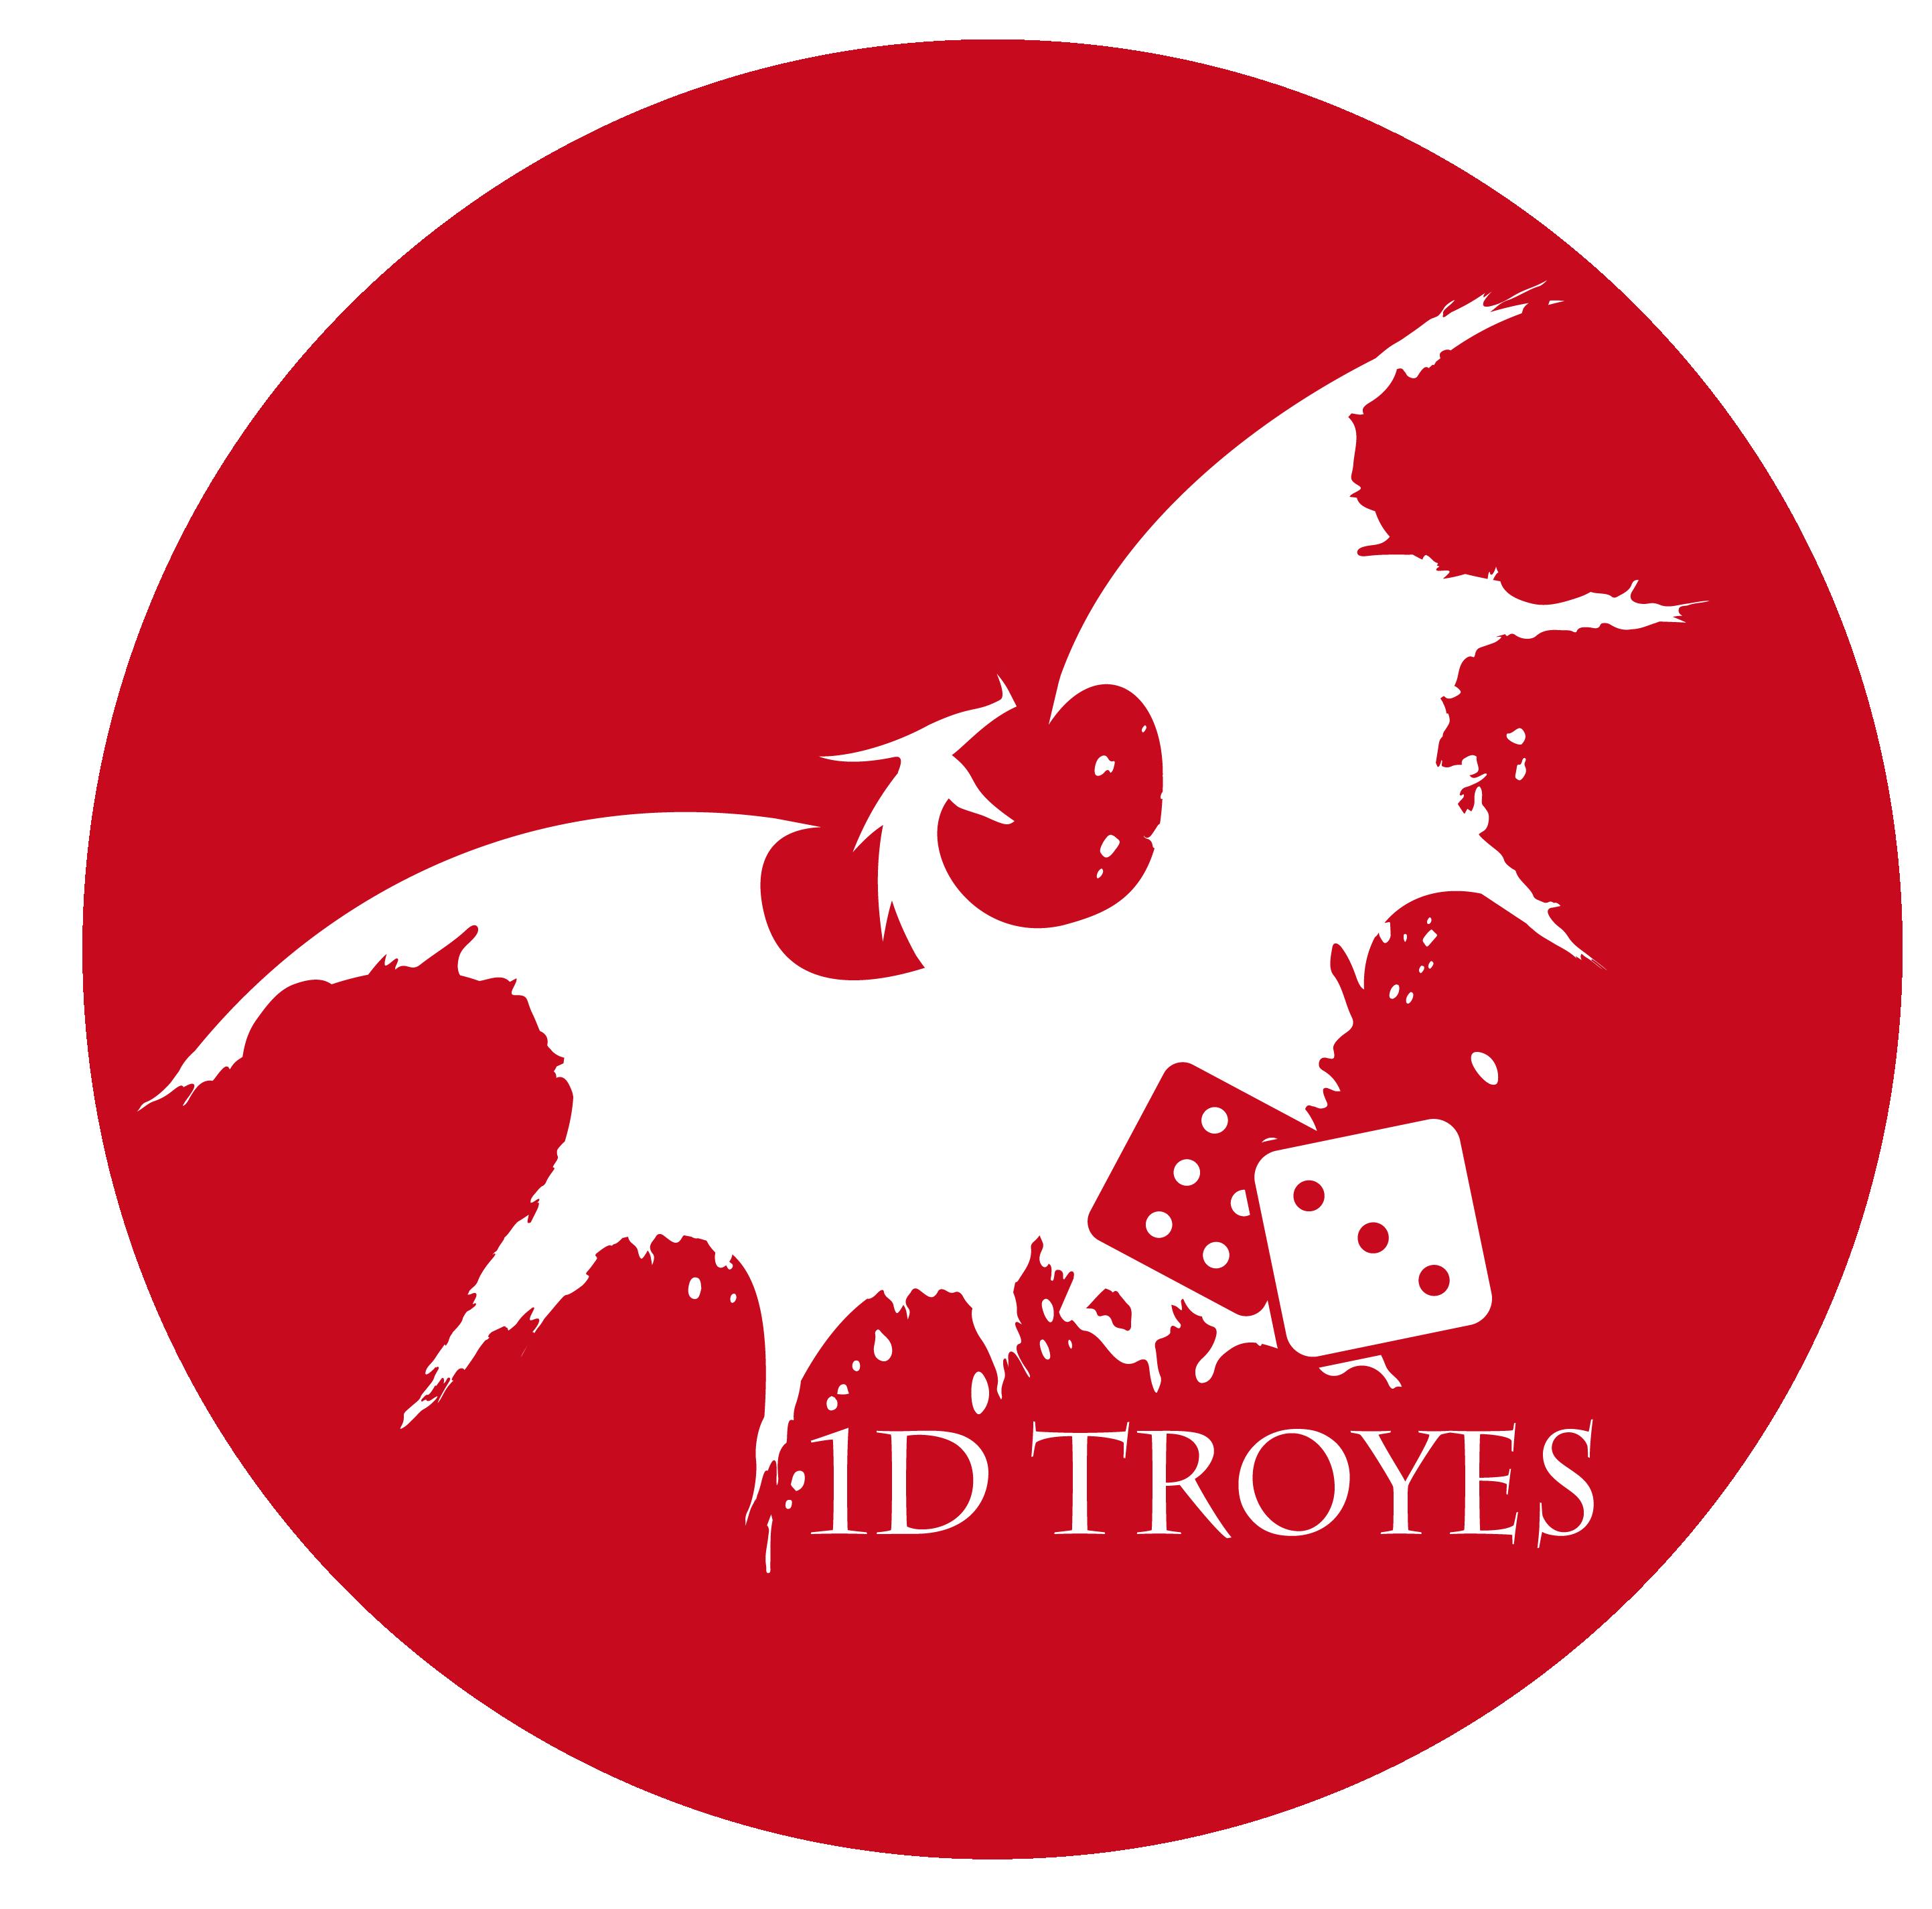 Club de jeux 1D Troyes | Warhammer, Warmachine, BloodBowl, LSDA